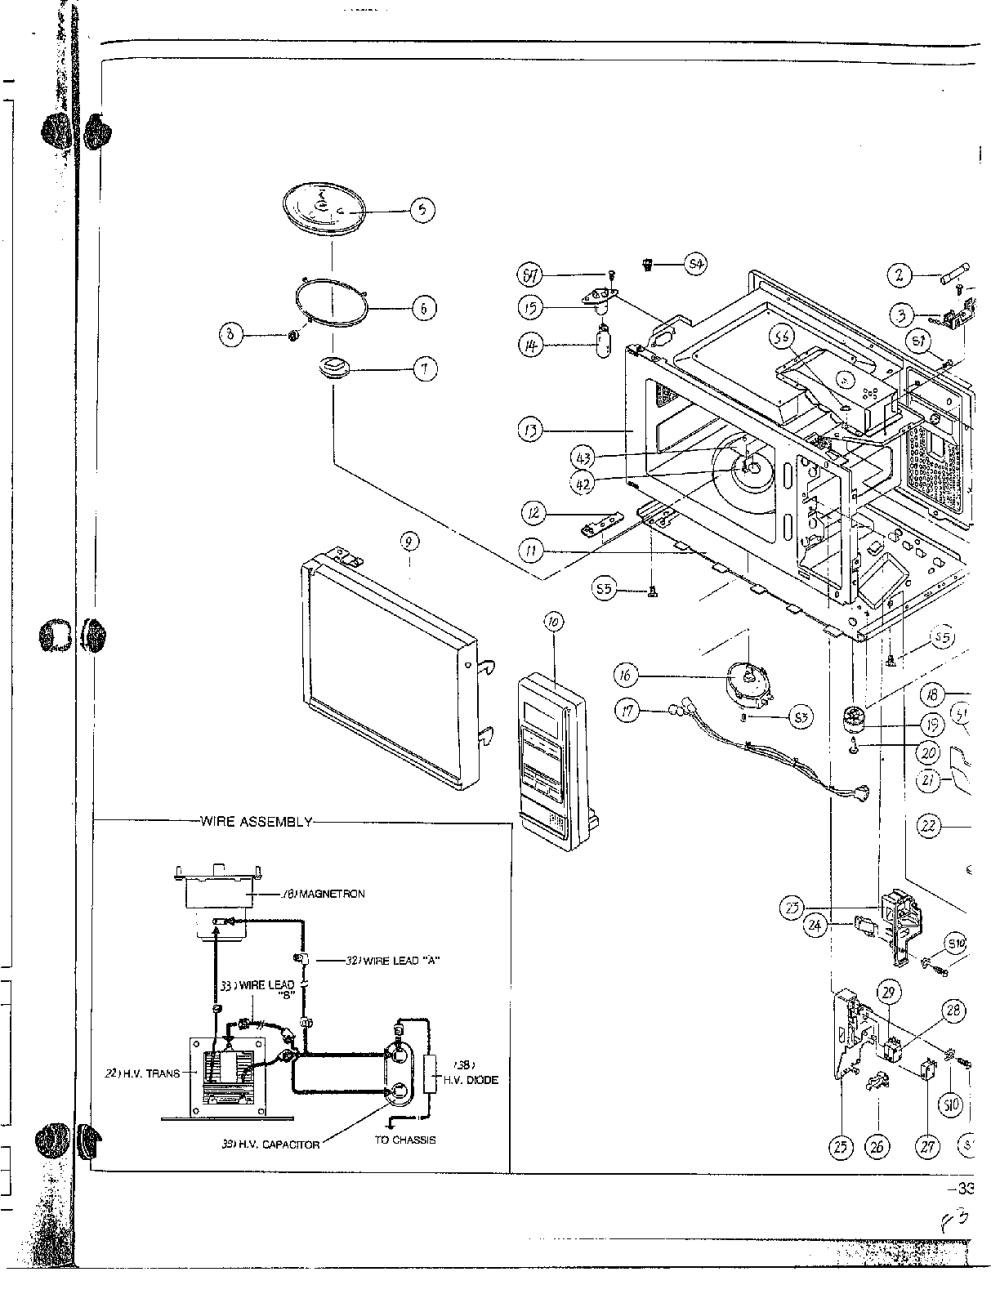 medium resolution of samsung microwave schematic wiring diagram origin samsung elec diagrams samsung microwave diagrams